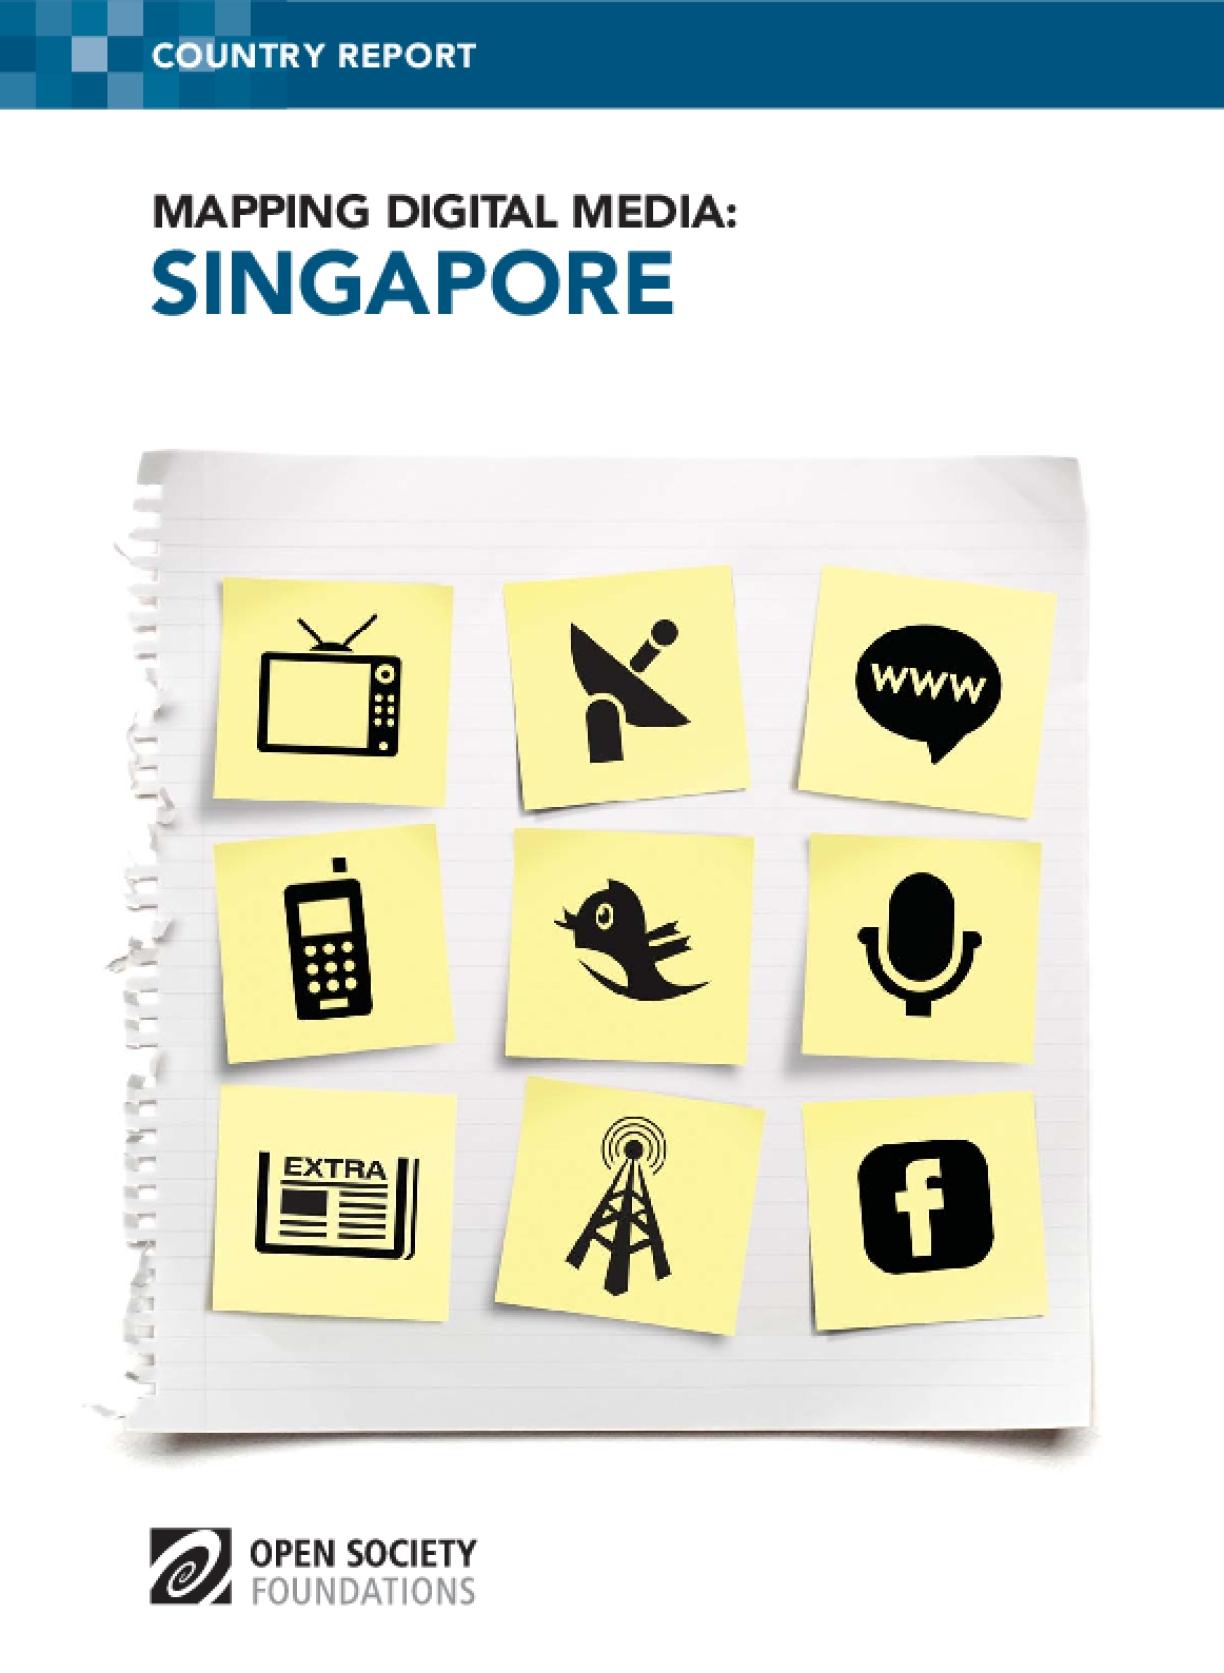 Mapping Digital Media: Singapore